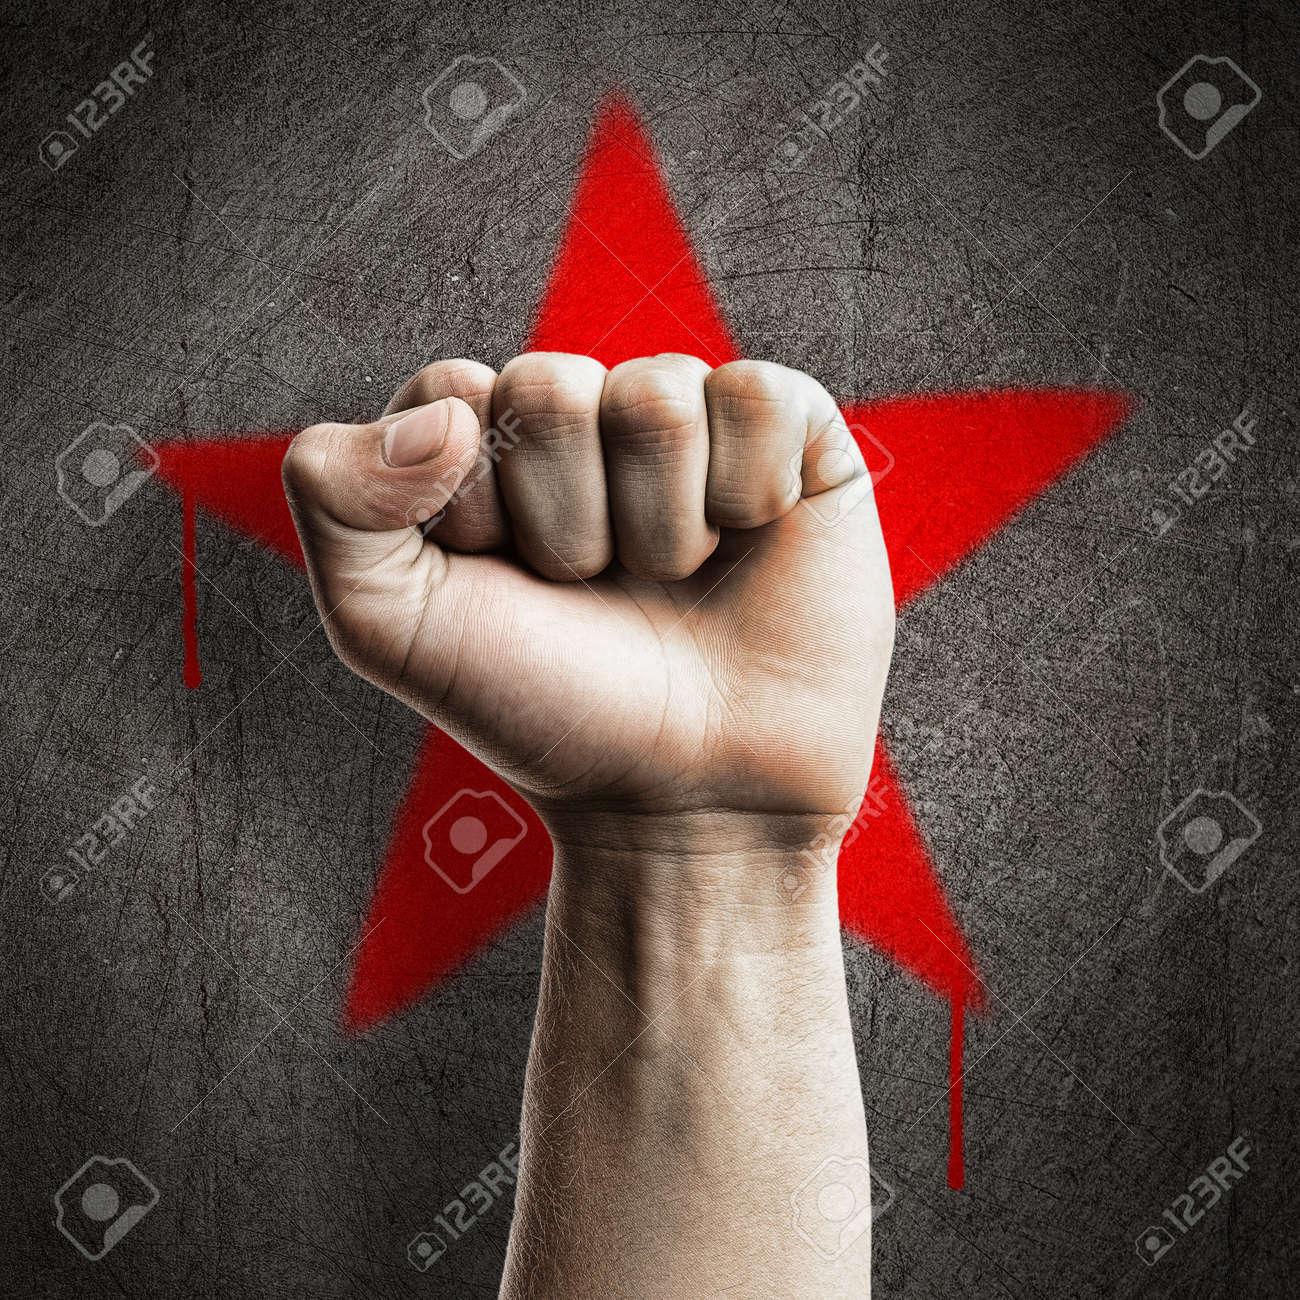 Фото русский кулак 3 фотография